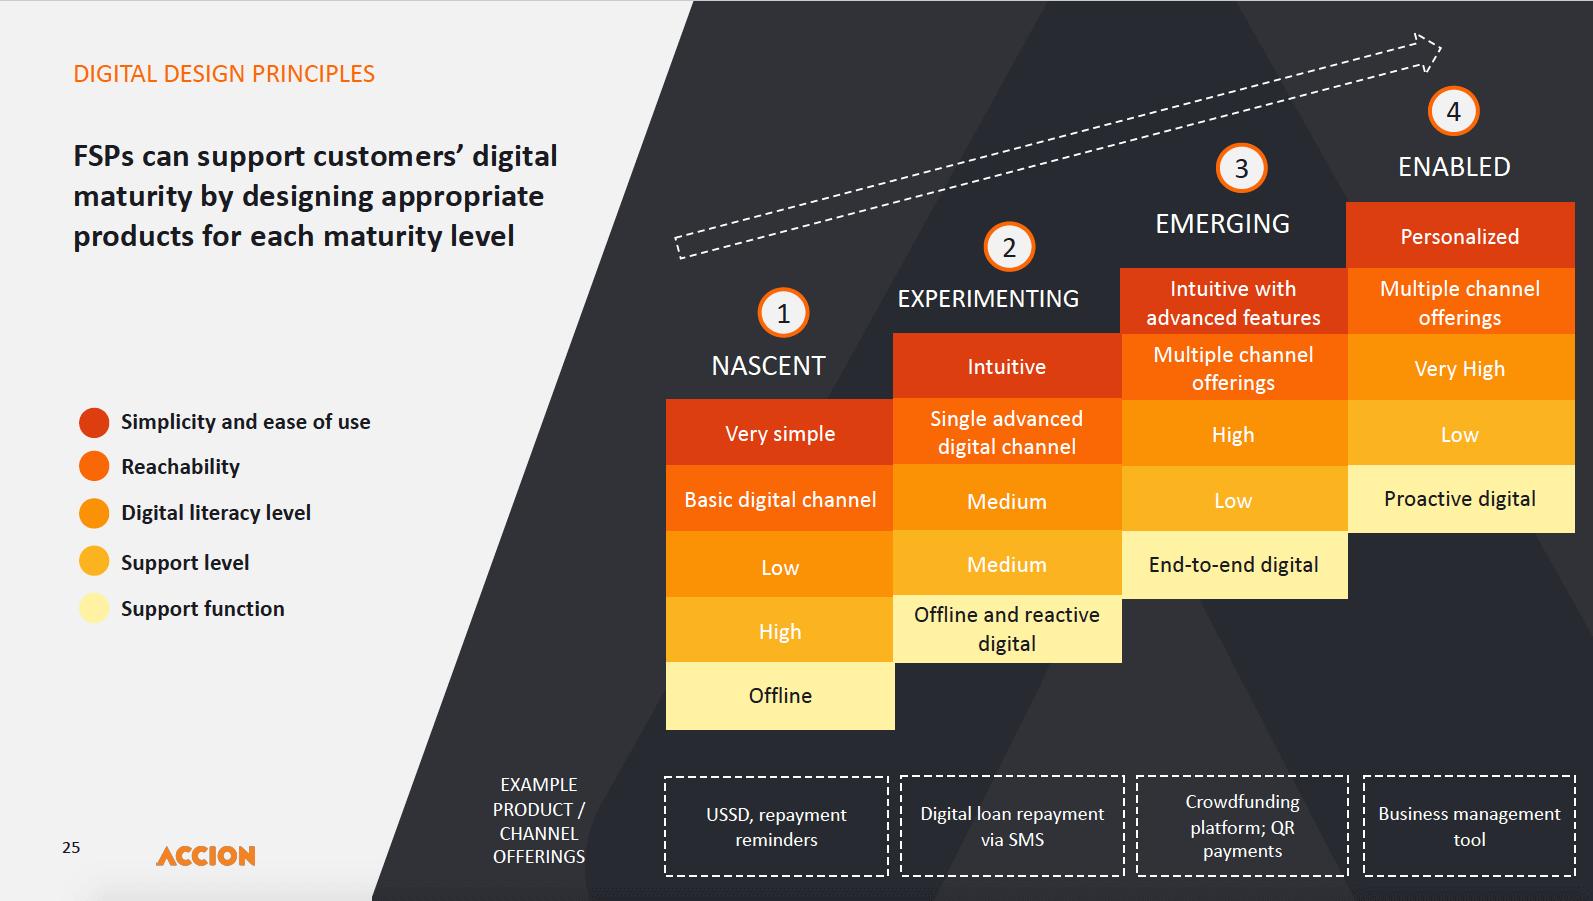 Digital Design Principles